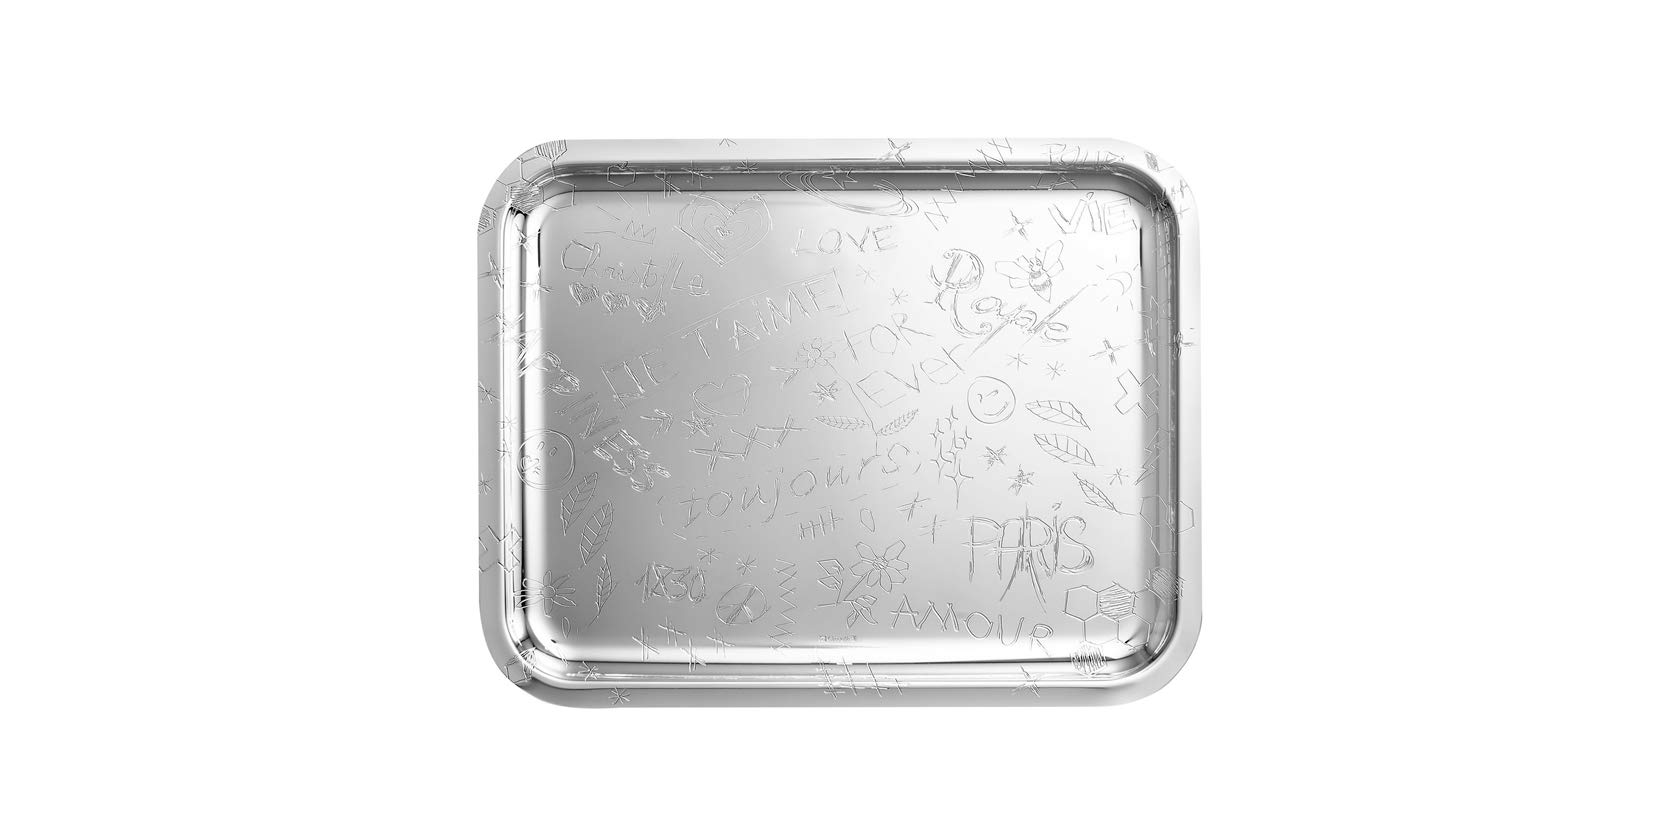 Christofle Graffiti Silver Plated Rectangular Tray #4200445